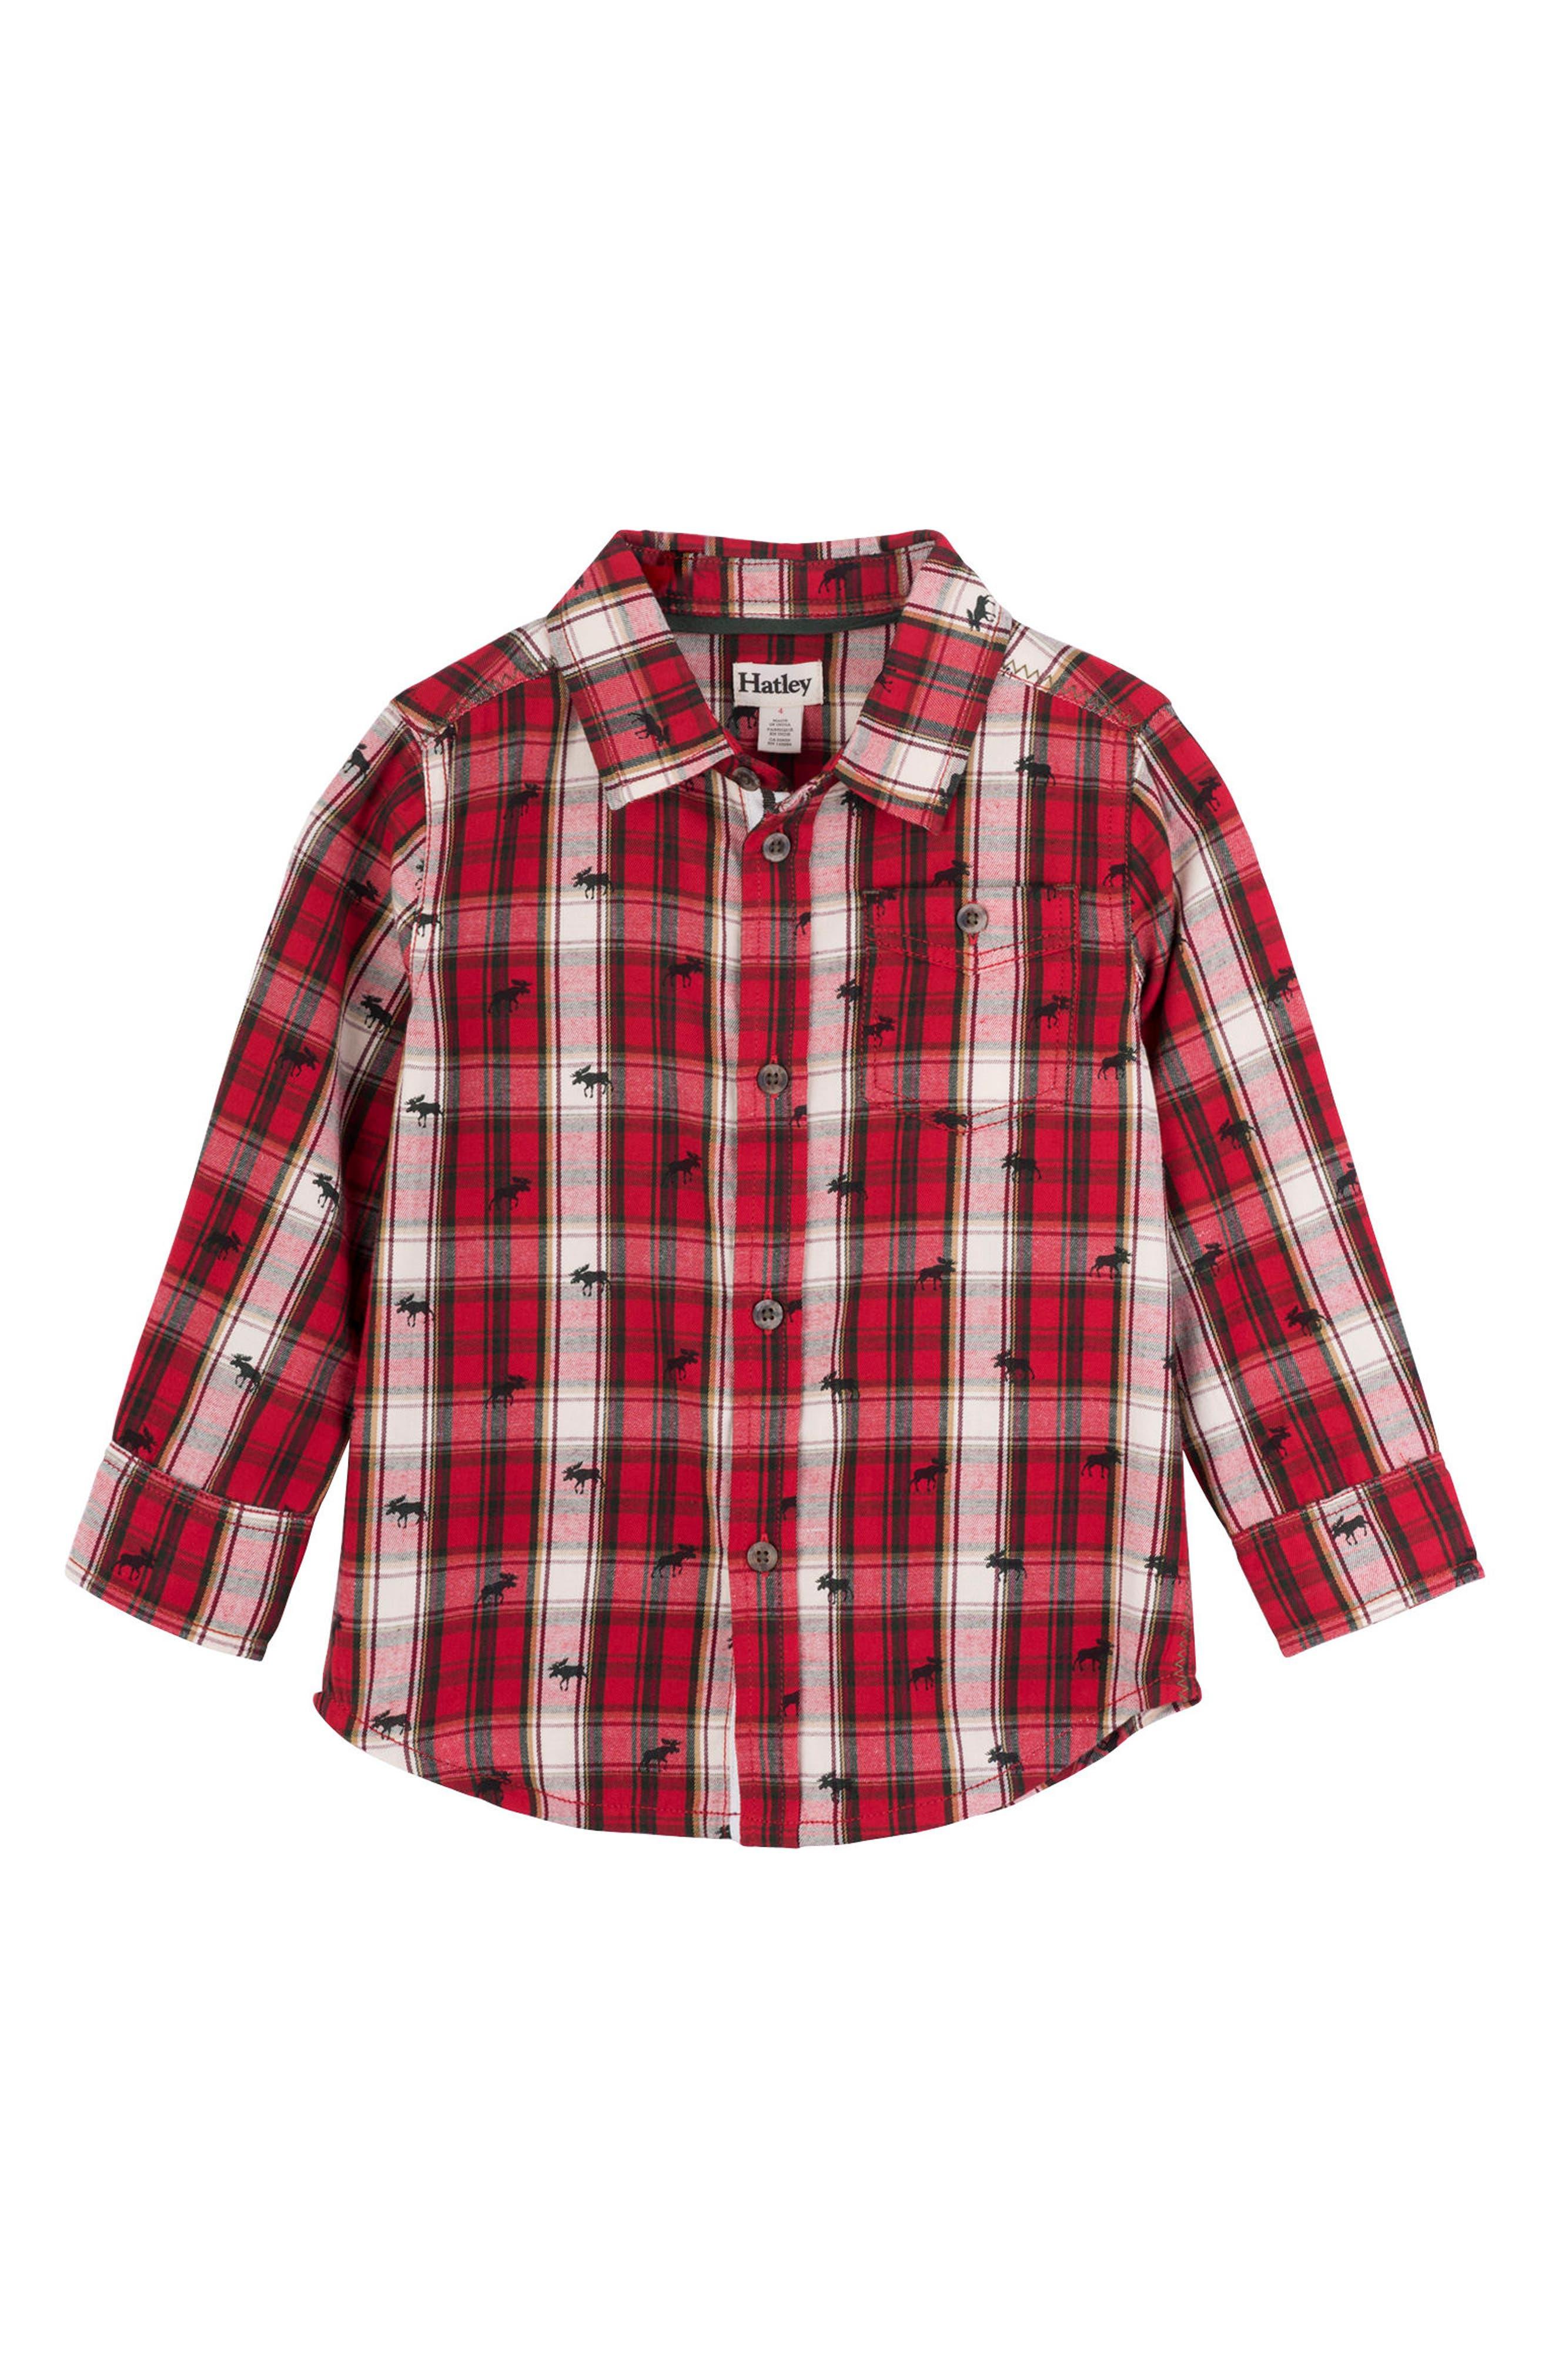 HATLEY, Tiny Moose Plaid Woven Shirt, Main thumbnail 1, color, RED